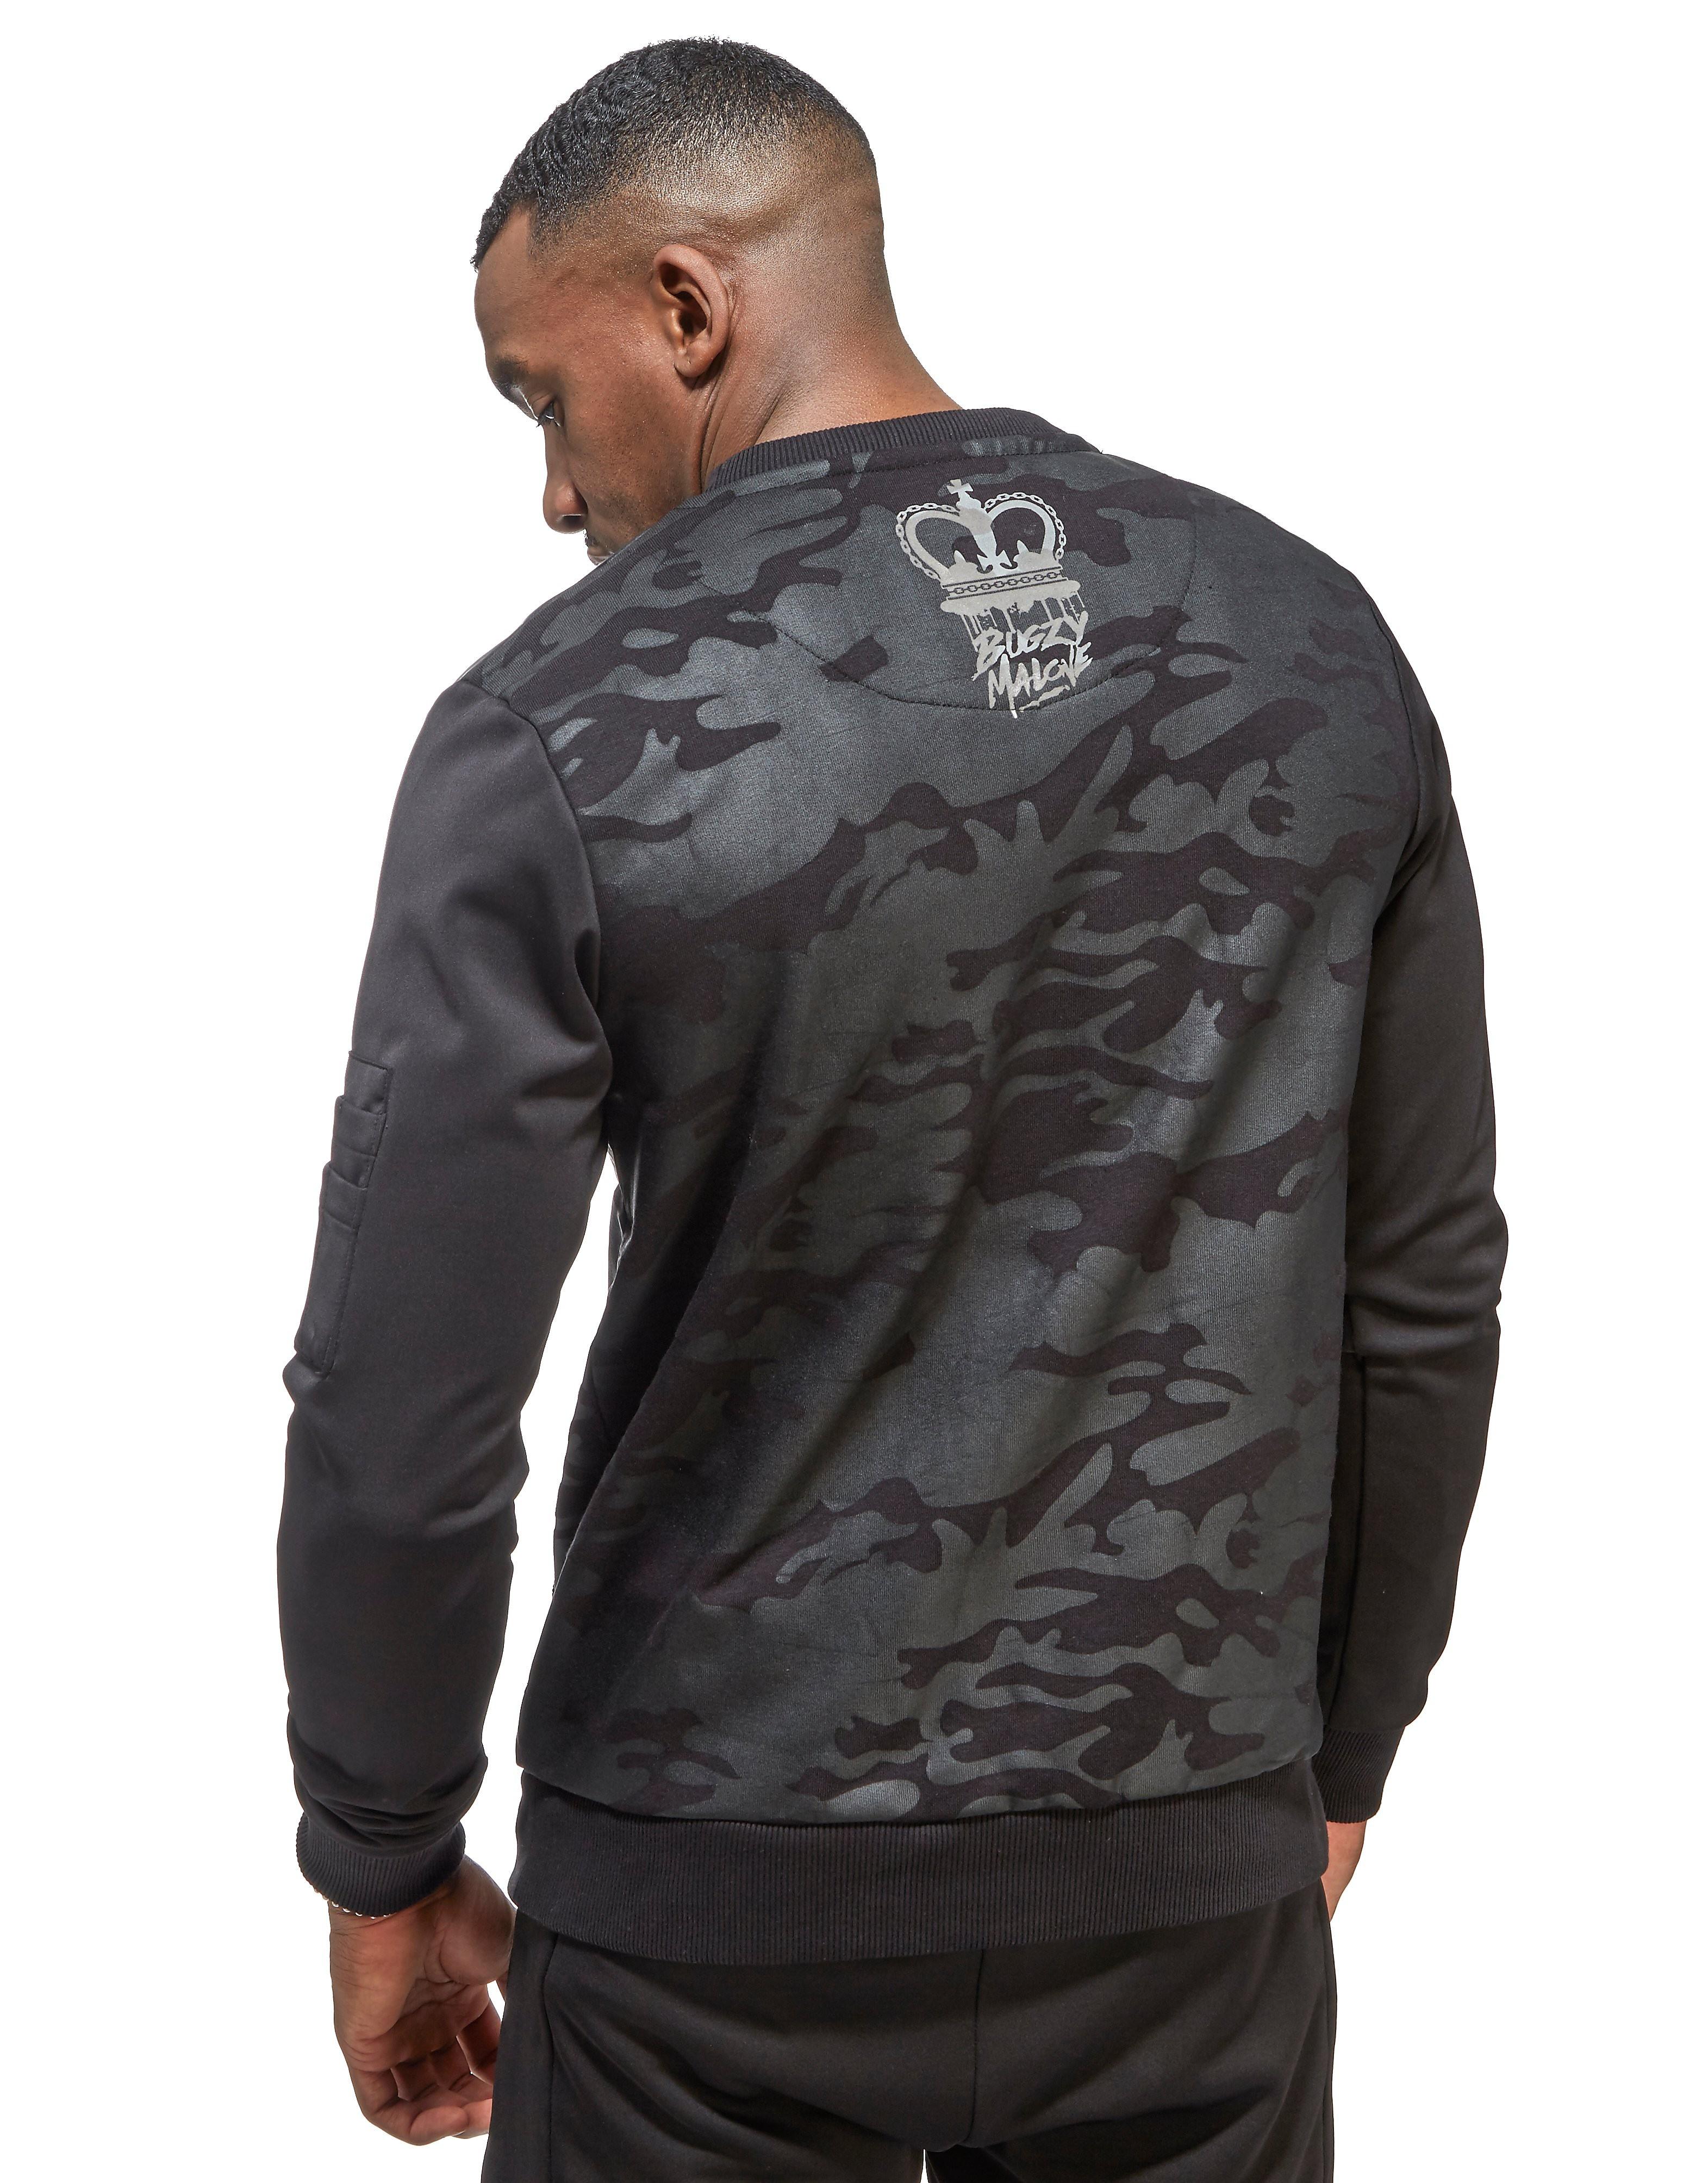 Supply & Demand Bugzy Malone King Crew Sweatshirt